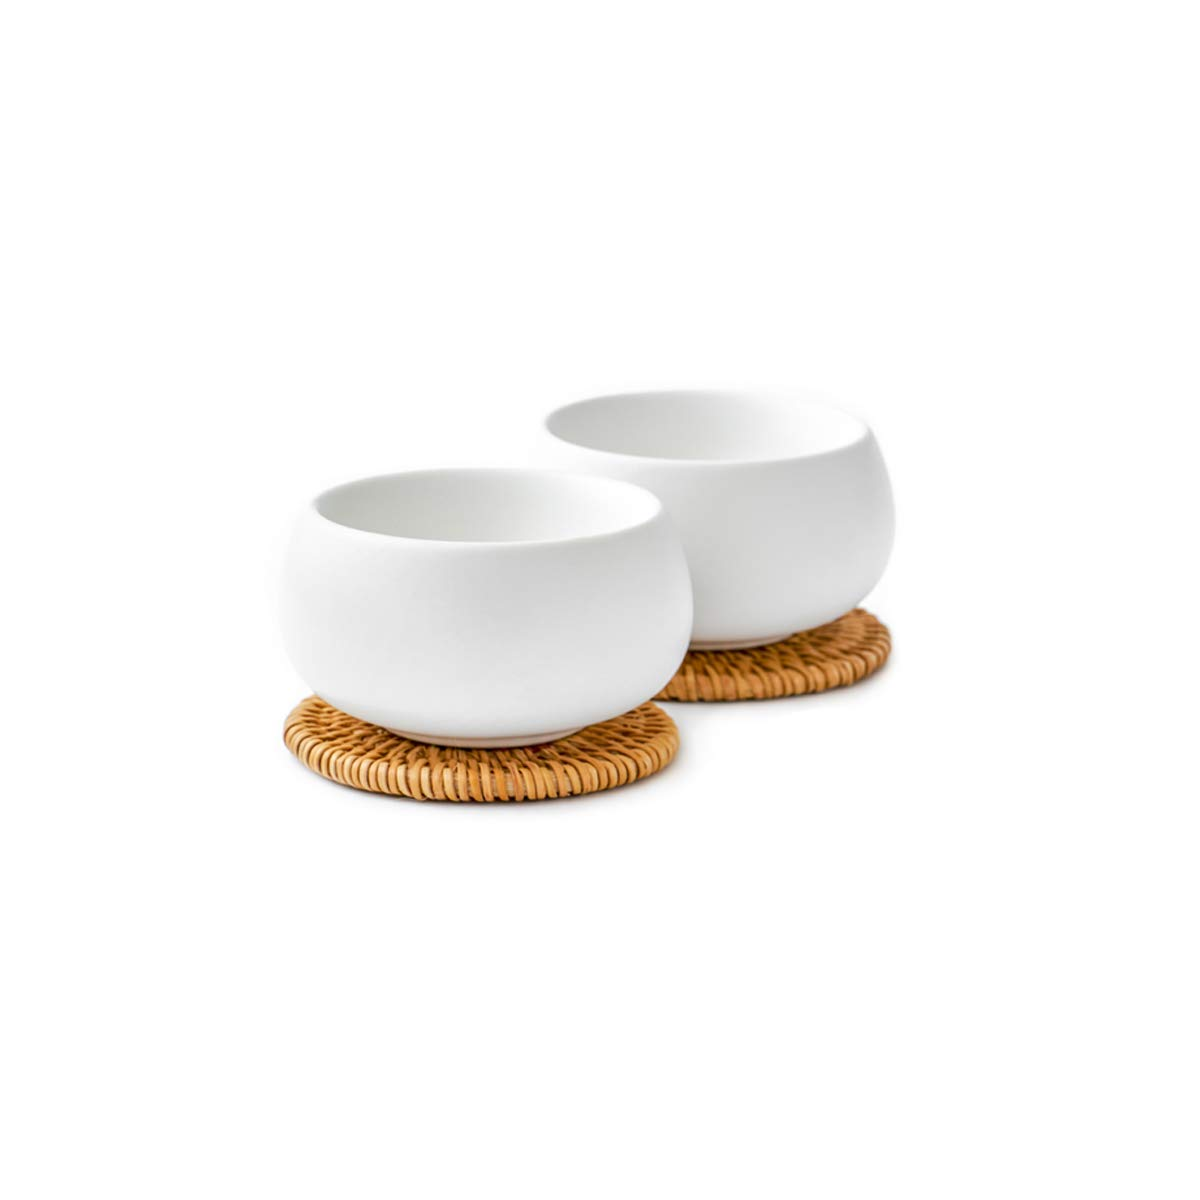 ZENS Tea Cup Set of 2, 55ml with Rattan Coasters, Double Wall Blue Ceramic, for Dessert Sauce Appetizer Ice Cream ZENSA5500486-C1100058